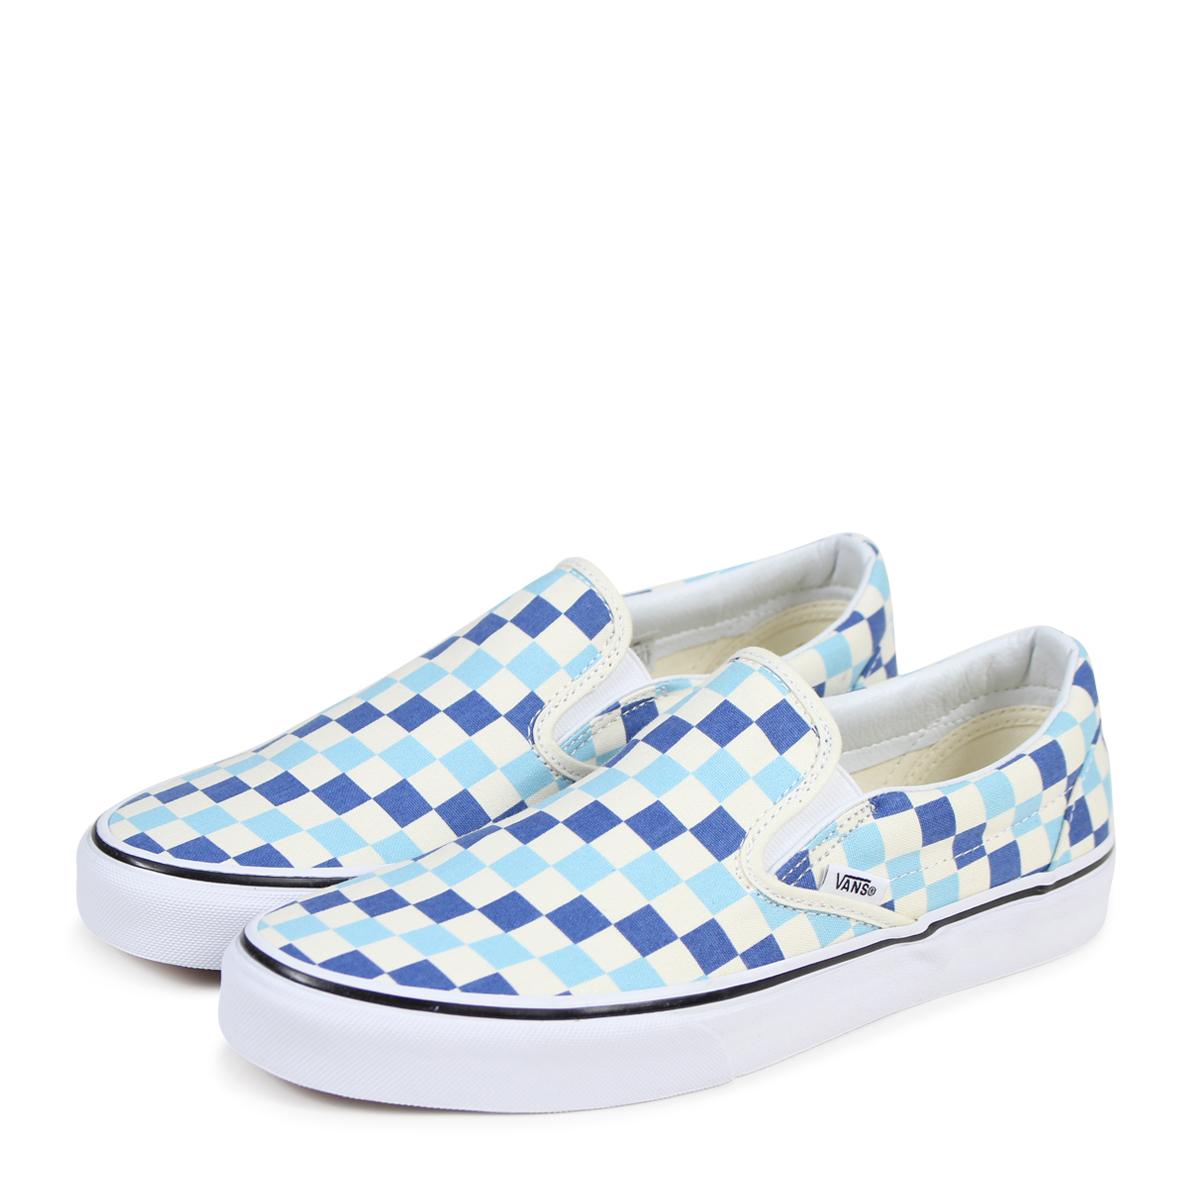 261b67a92586 ALLSPORTS  VANS CLASSIC SLIP-ON slip-ons sneakers men vans station ...